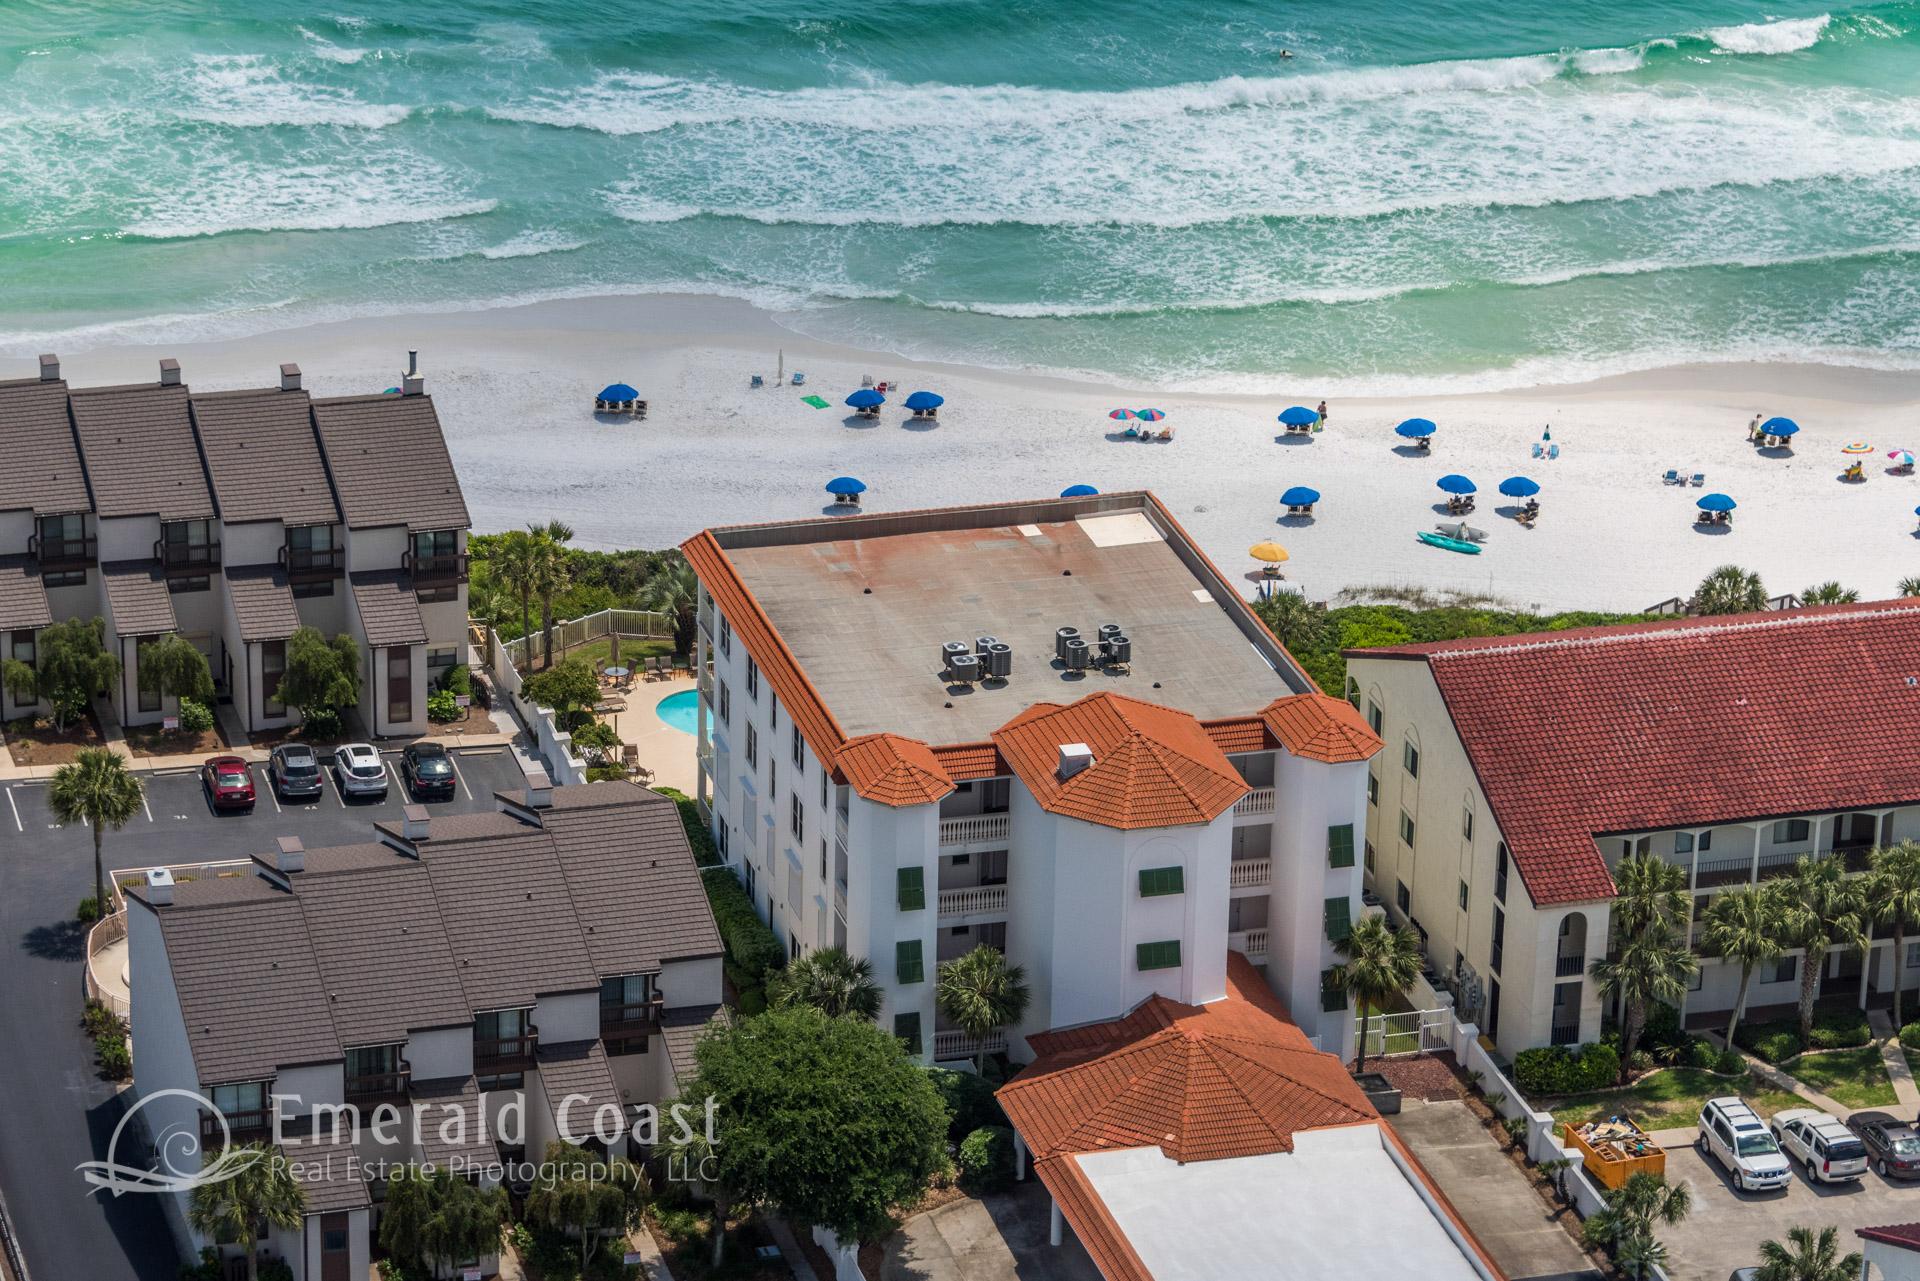 Aerial Photo of Grand Play Seacrest Beach, Florida